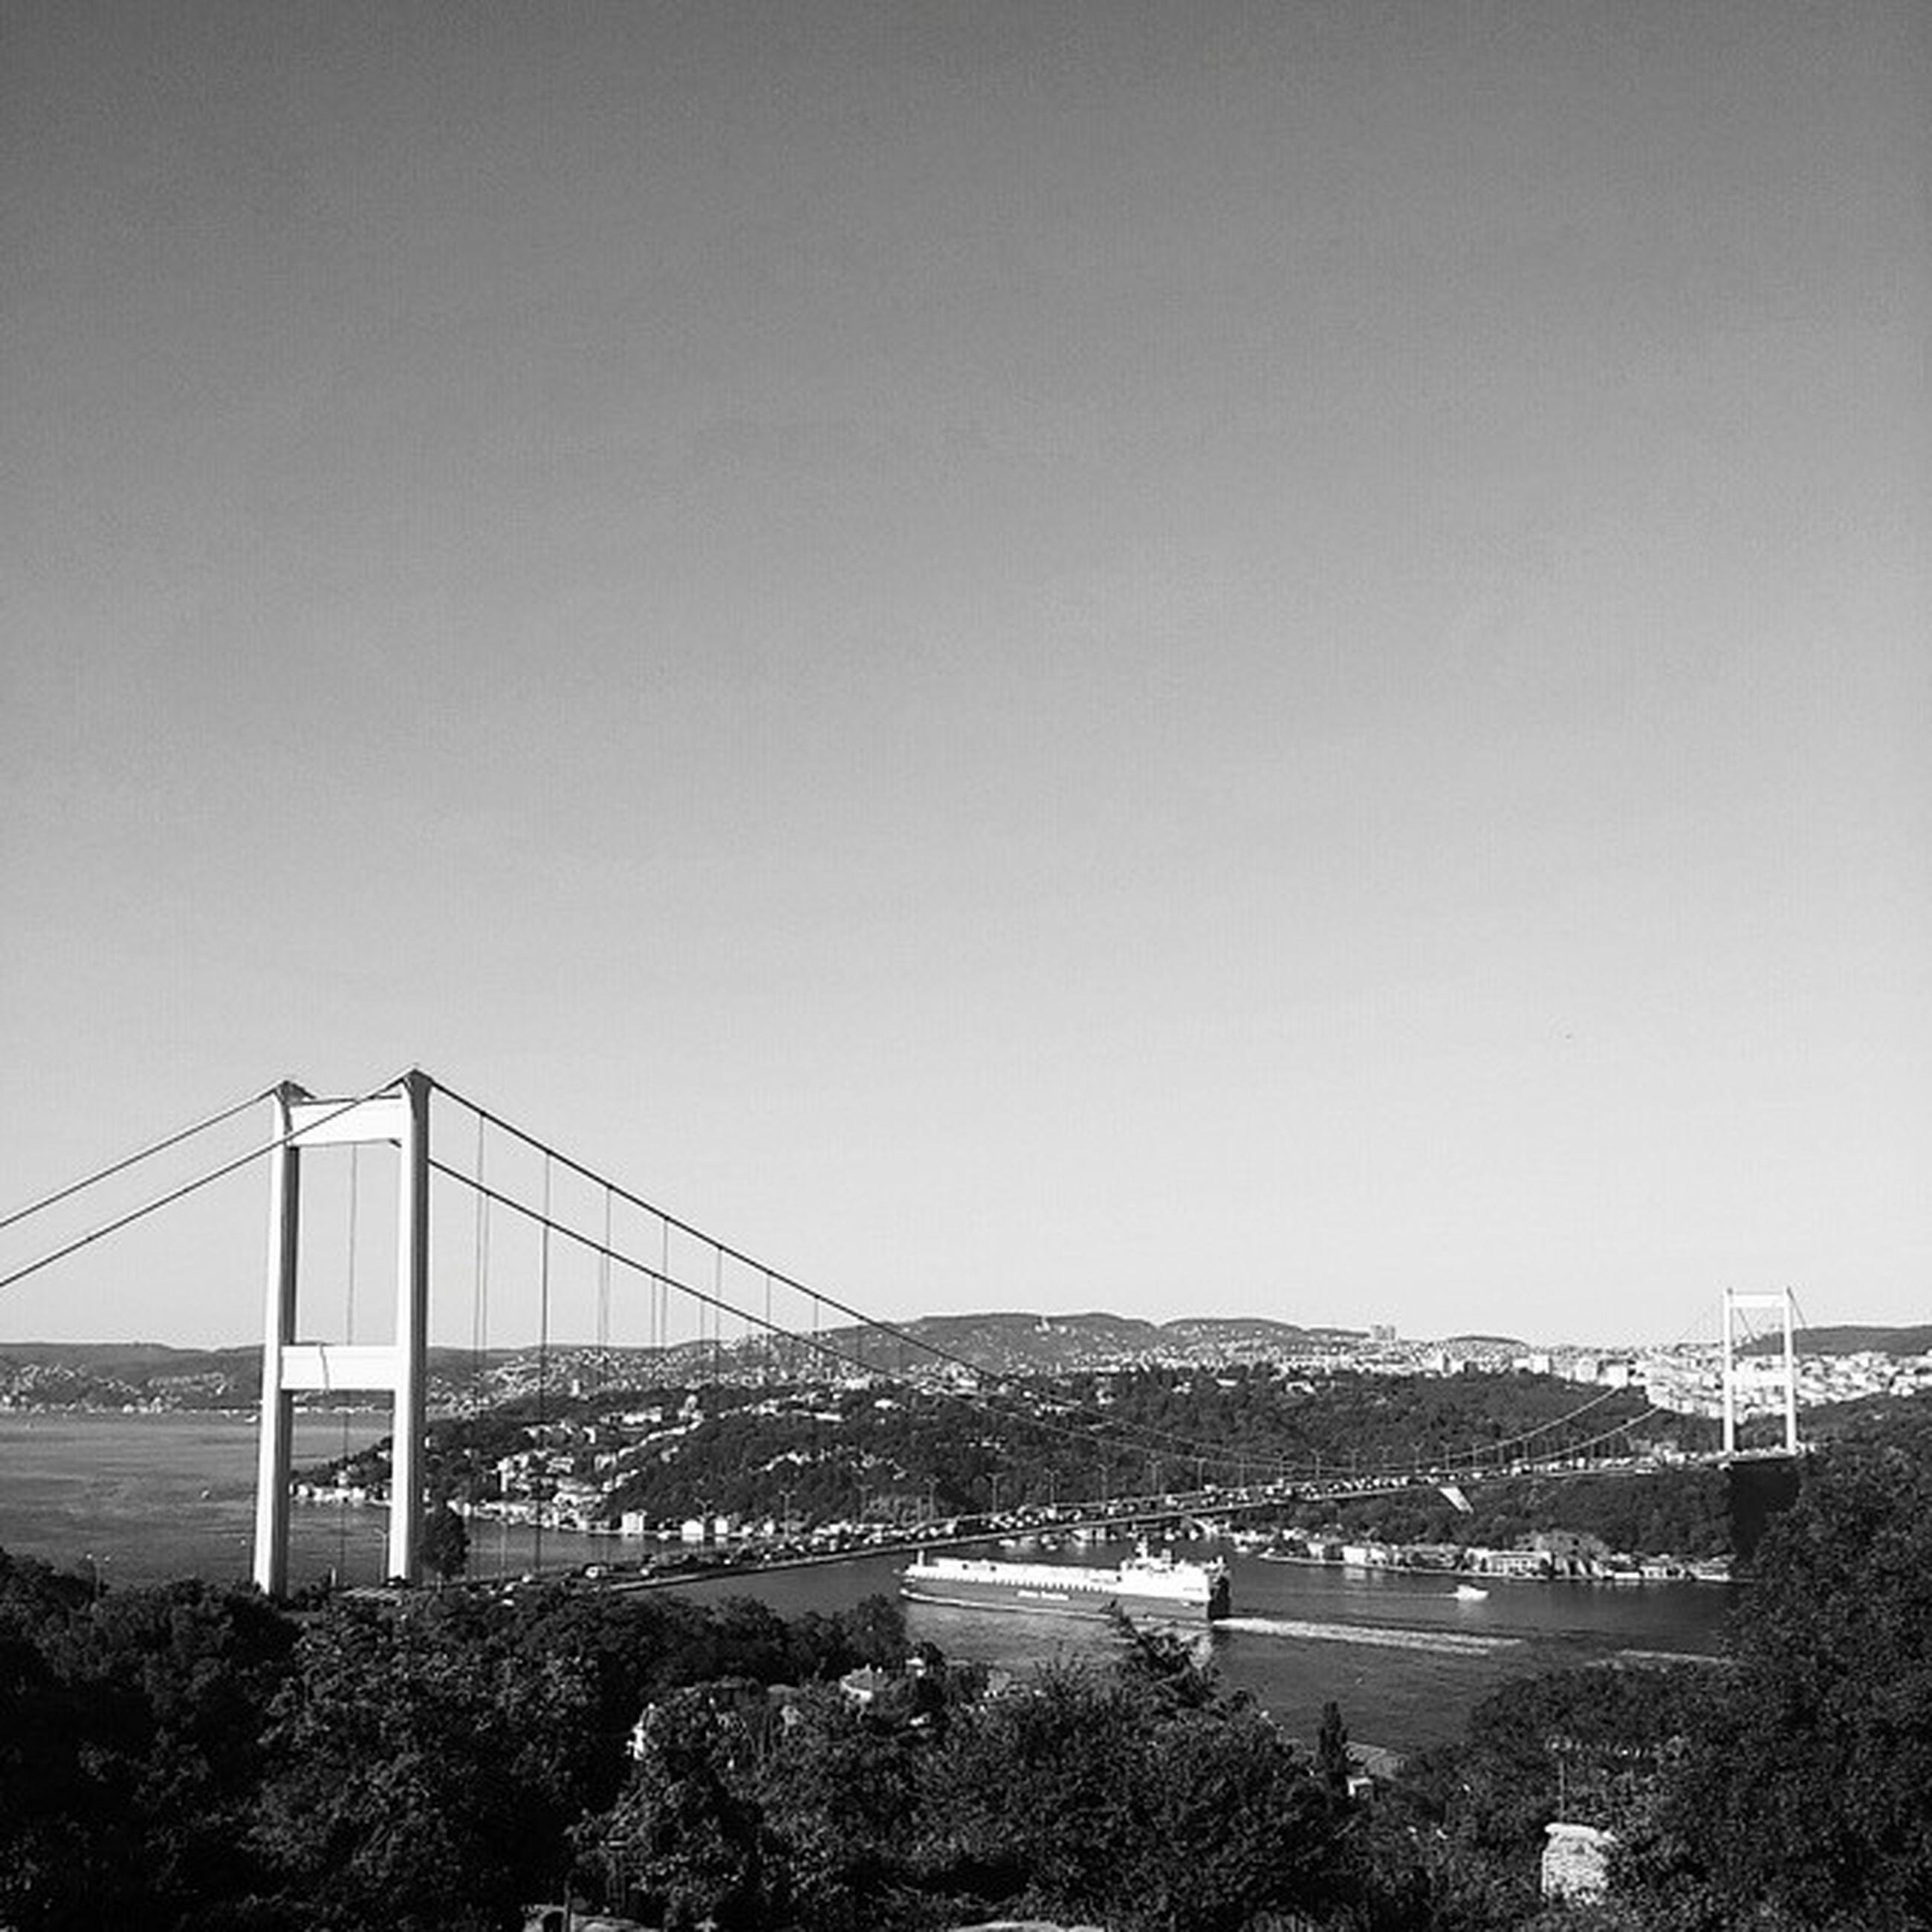 built structure, architecture, connection, bridge - man made structure, clear sky, copy space, engineering, suspension bridge, transportation, water, bridge, river, sea, building exterior, travel destinations, city, outdoors, travel, day, no people